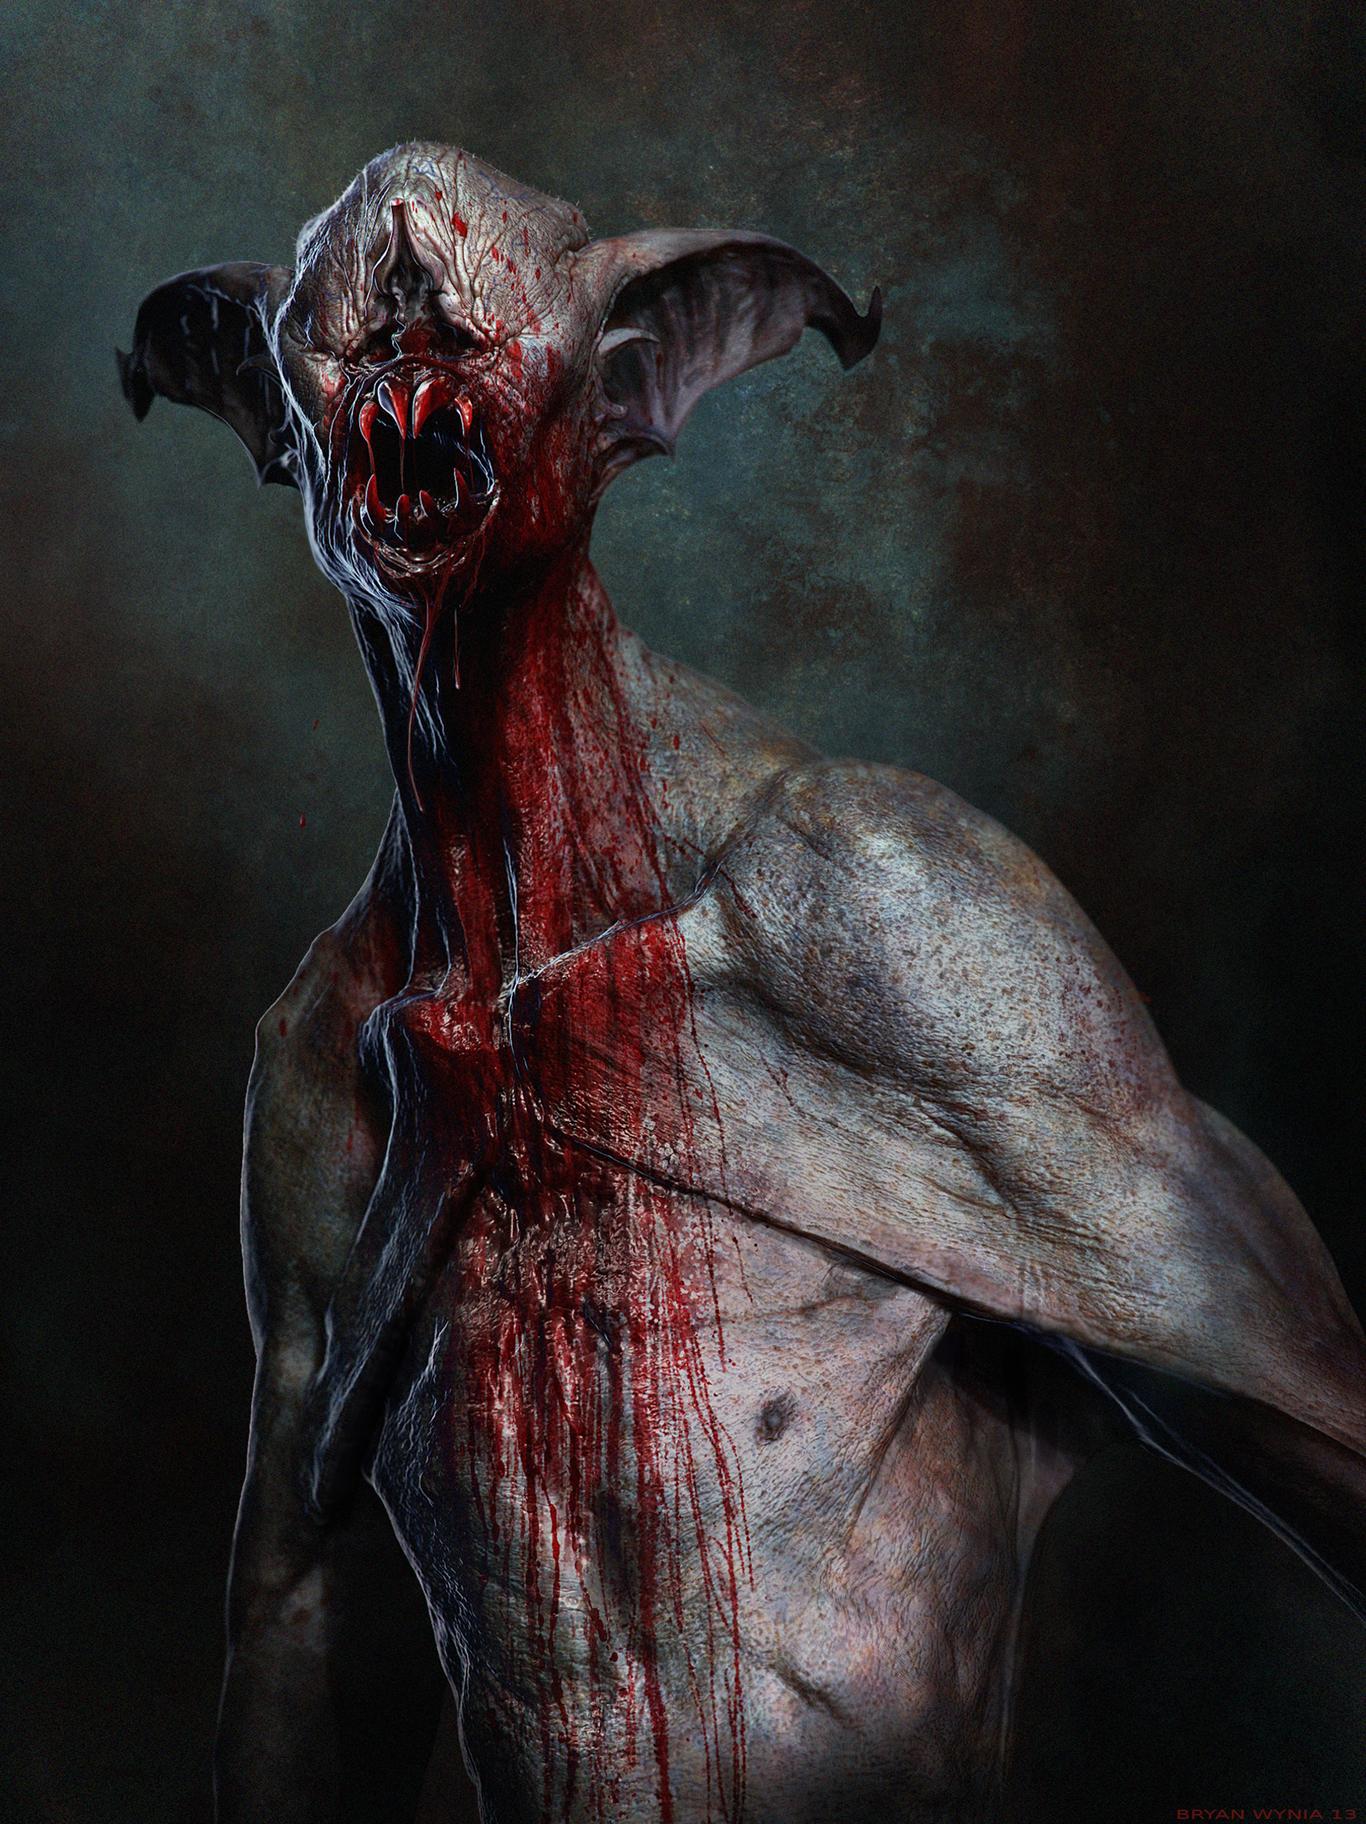 Cryptcreeper vampire grunt 1 059a6724 1ltj